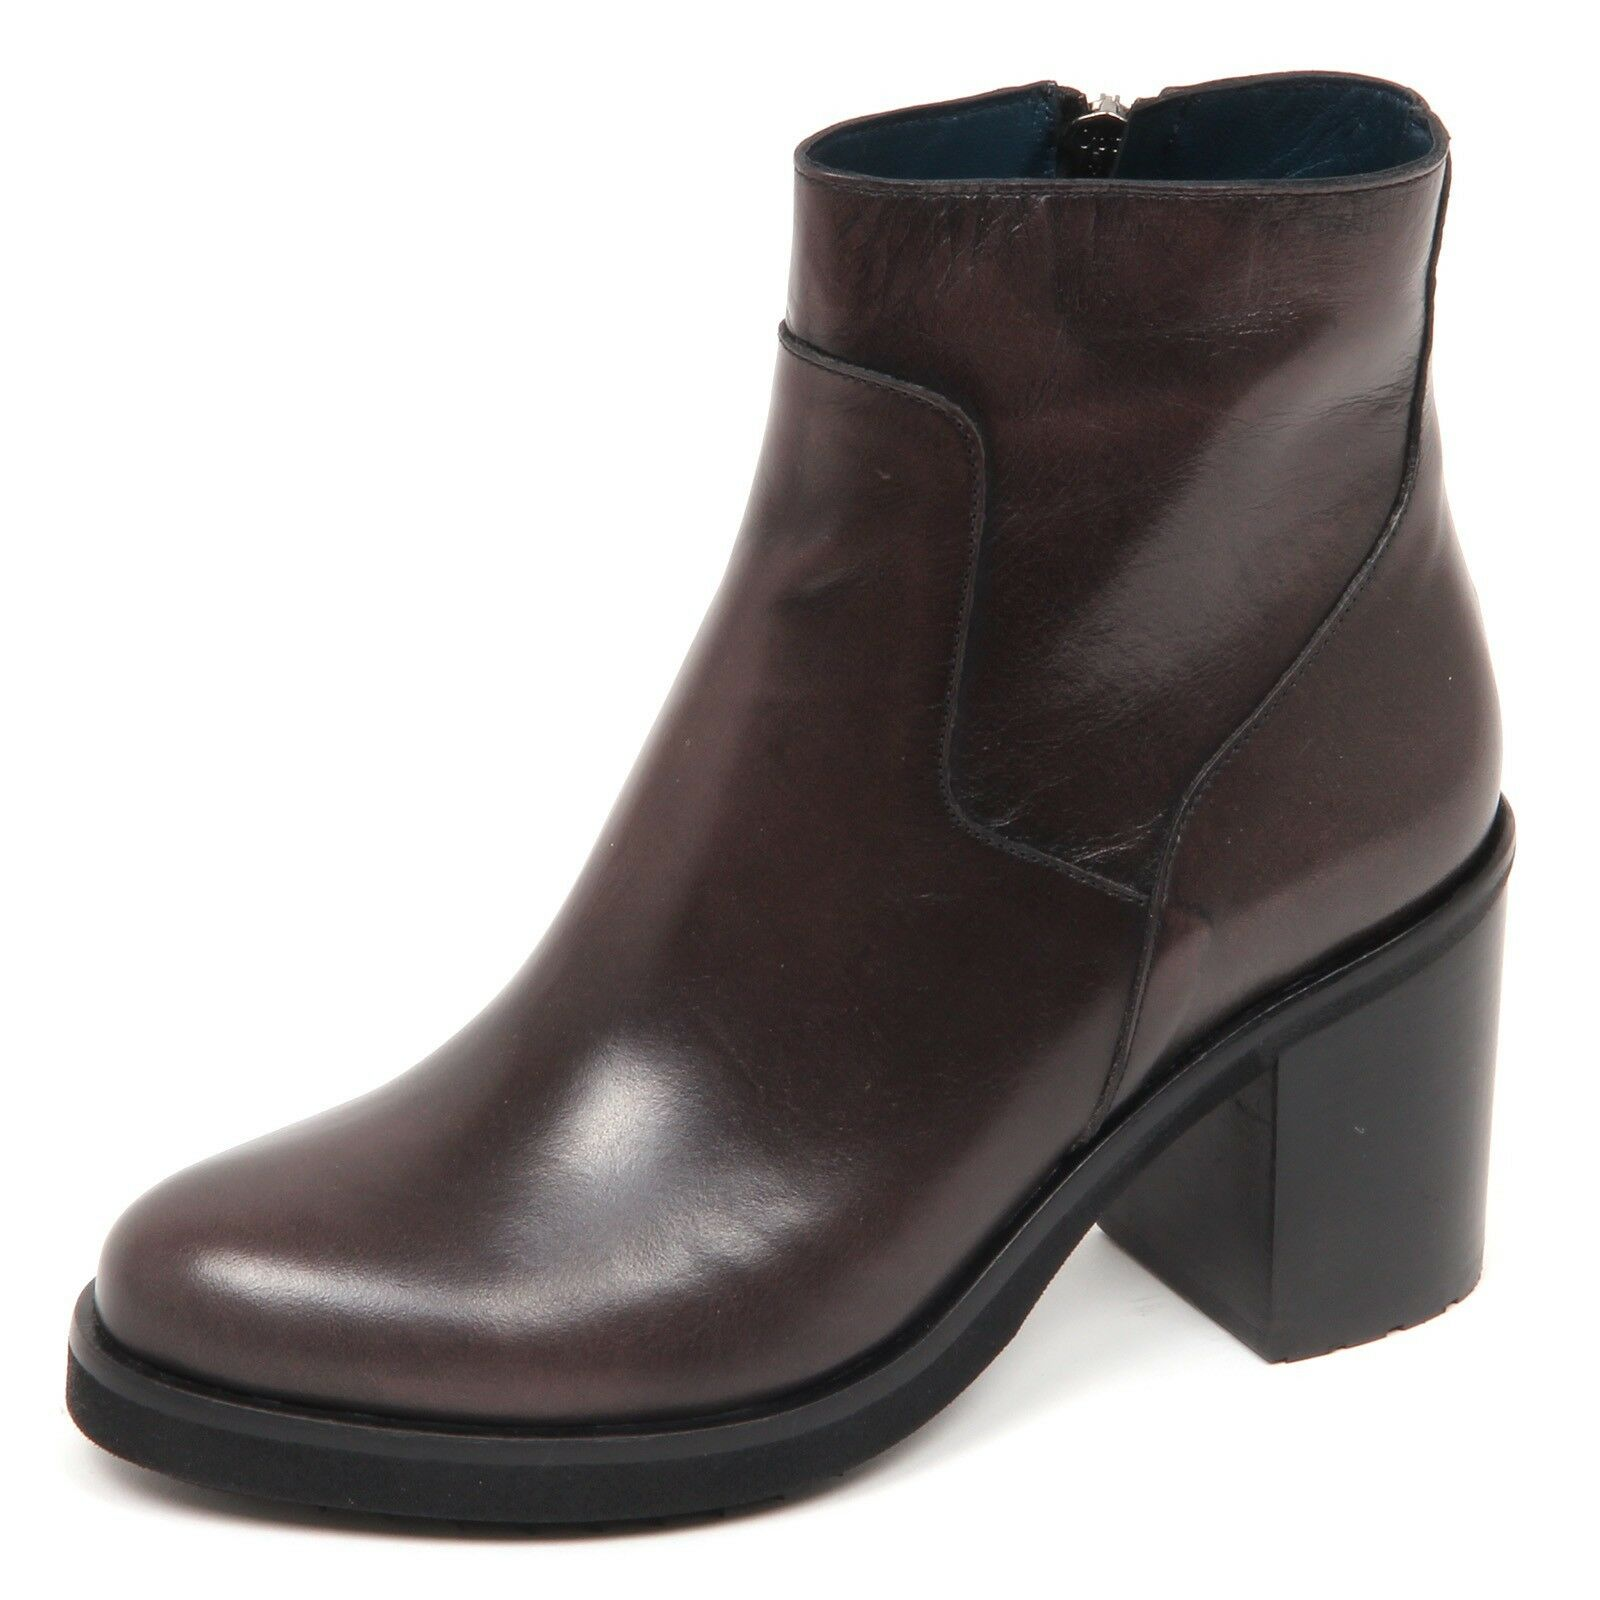 E1160 tronchetto donna brush grey LE BLE shoe boot woman